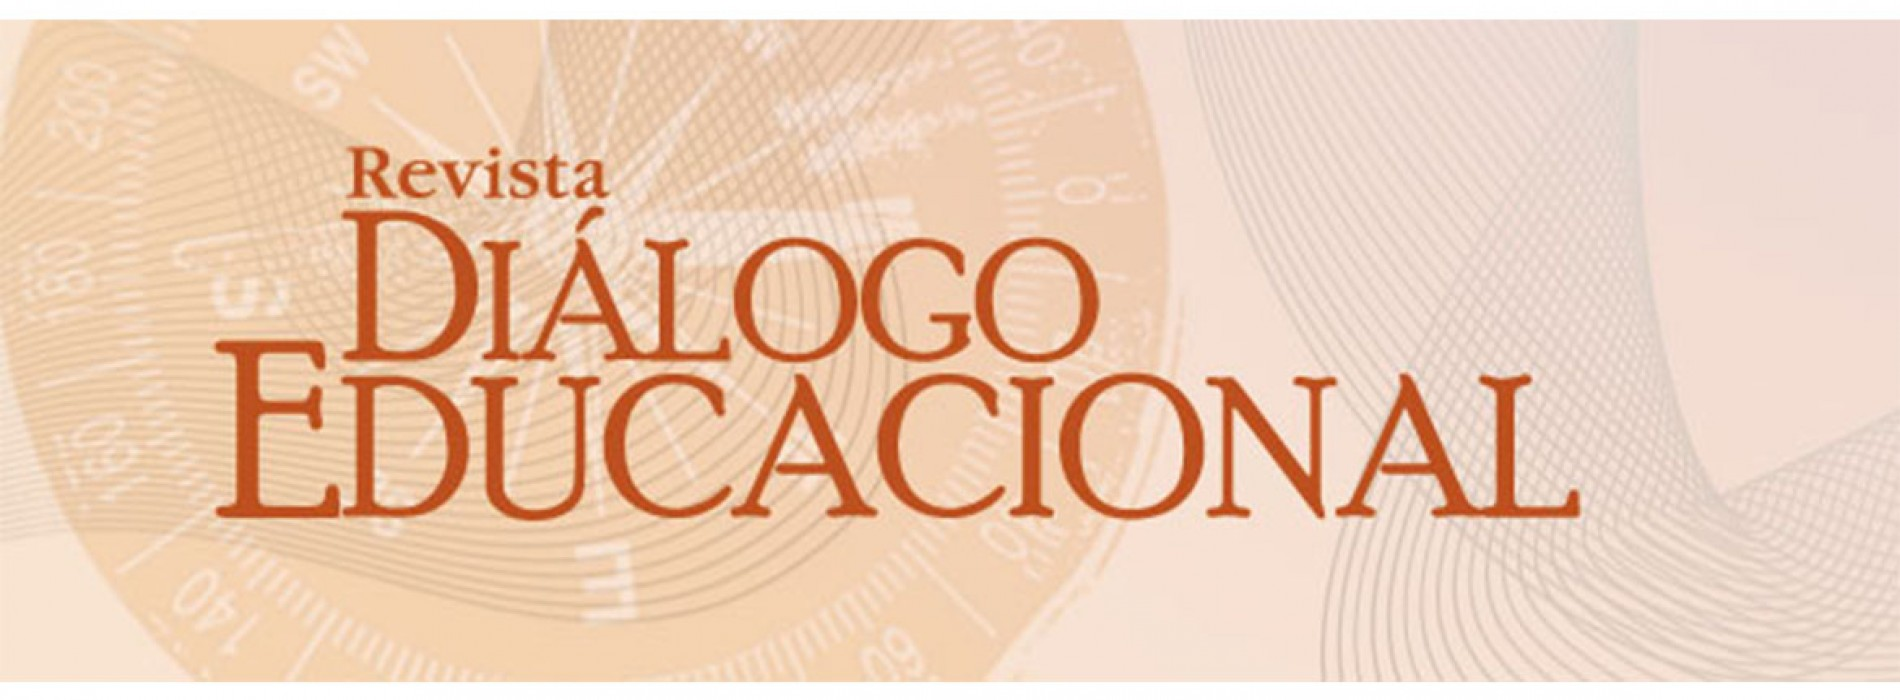 Revista Diálogo Educacional abriu chamada para artigos